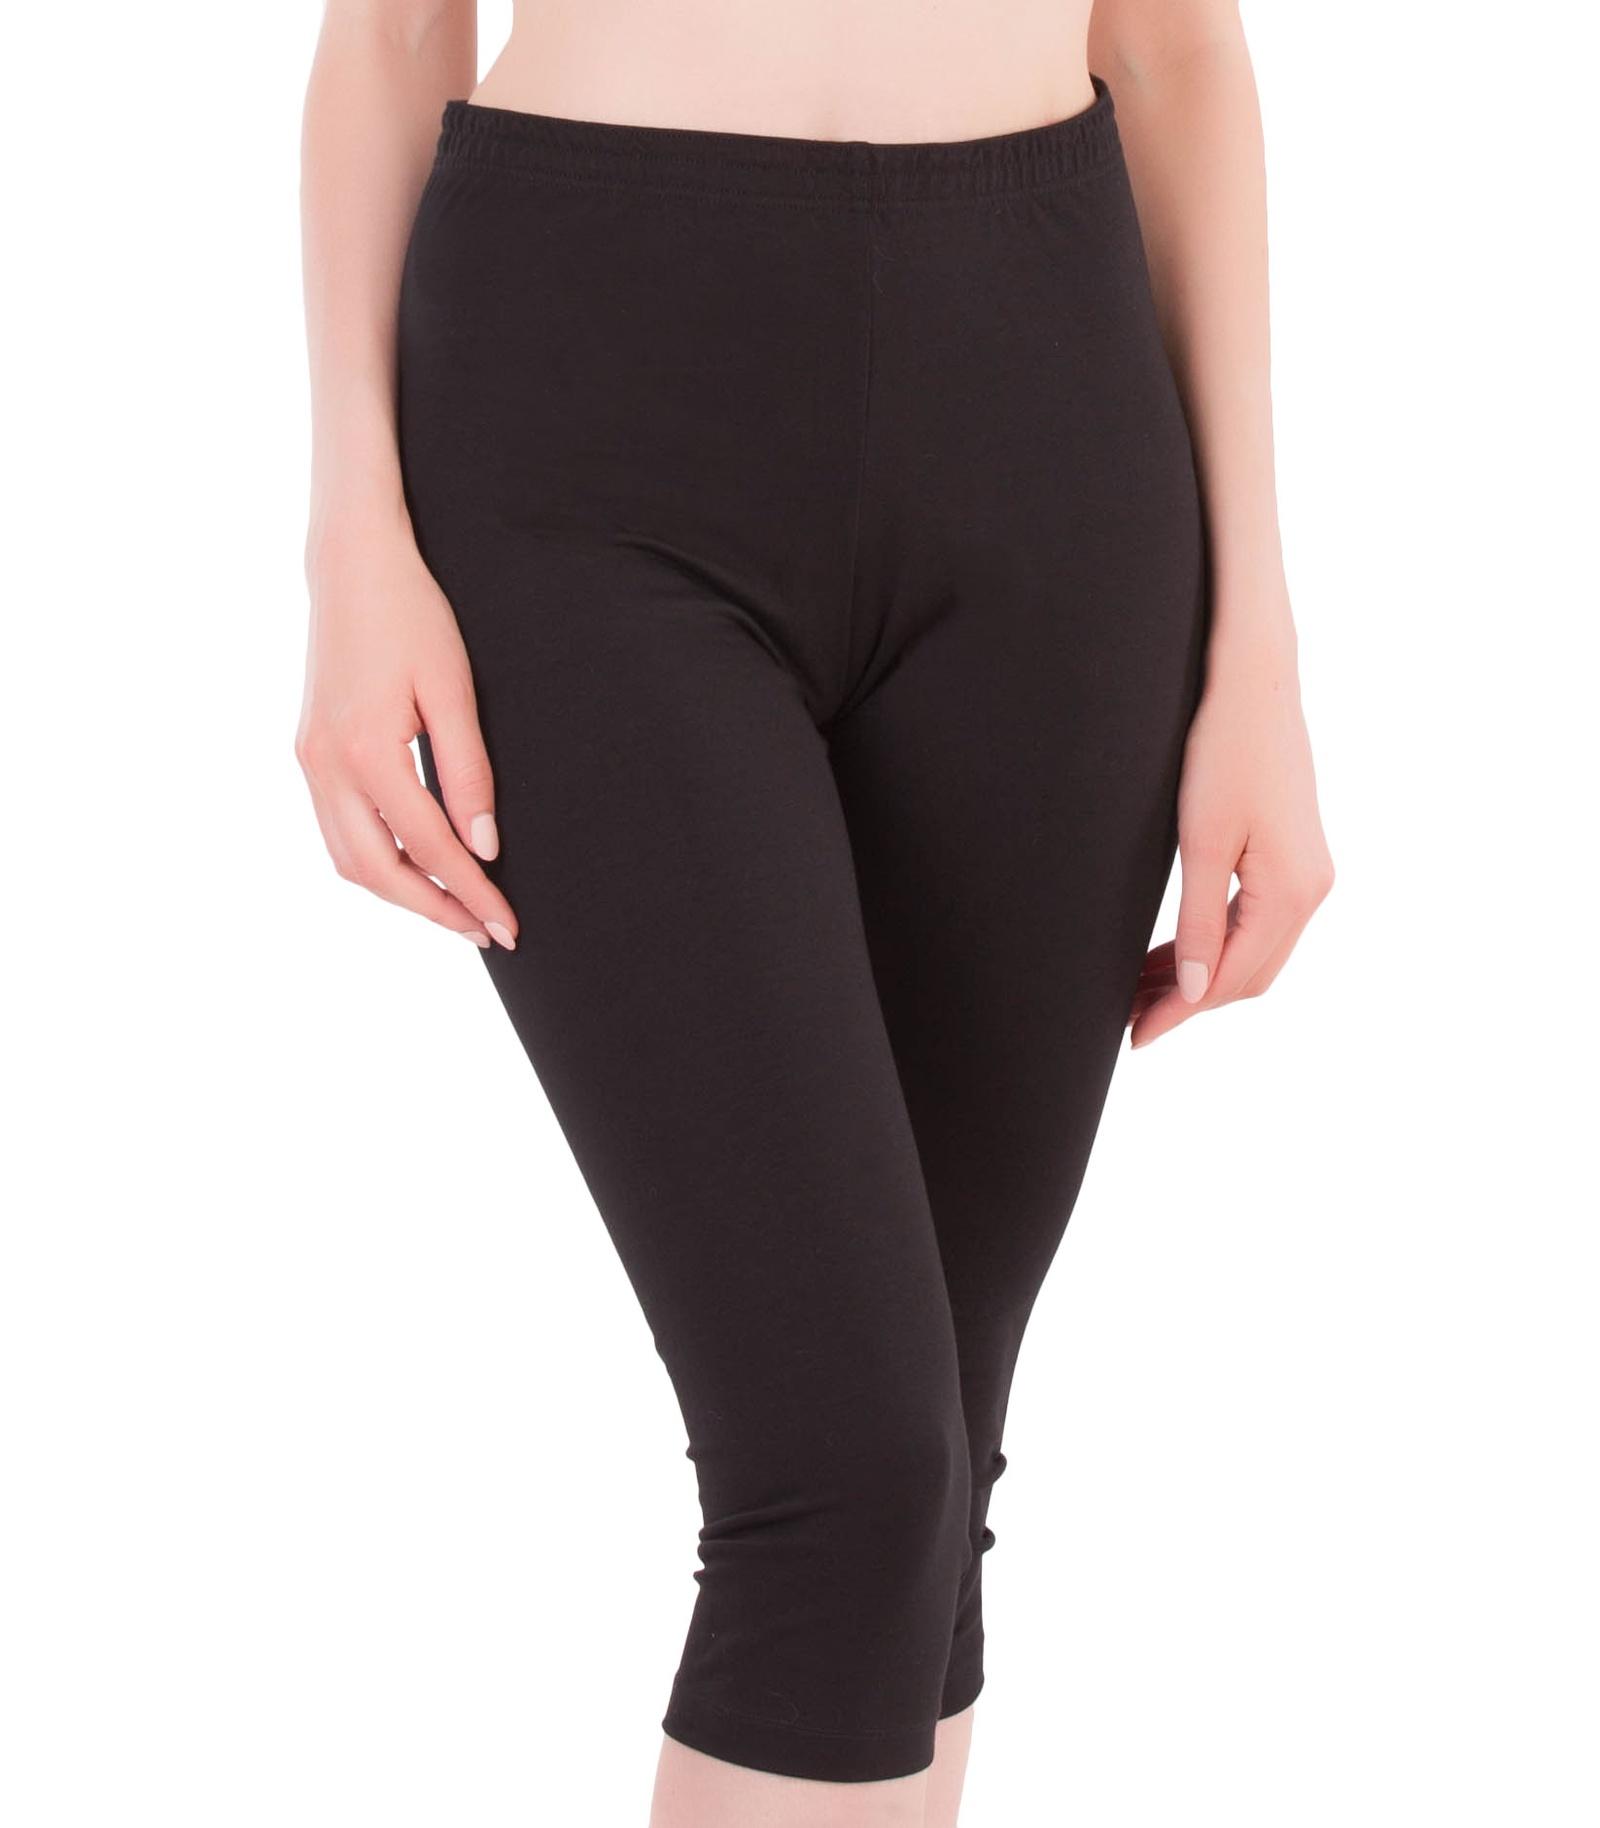 Брюки Serge брюки женские oodji ultra цвет черный 11706203 5b 14917 2900n размер 44 170 50 170